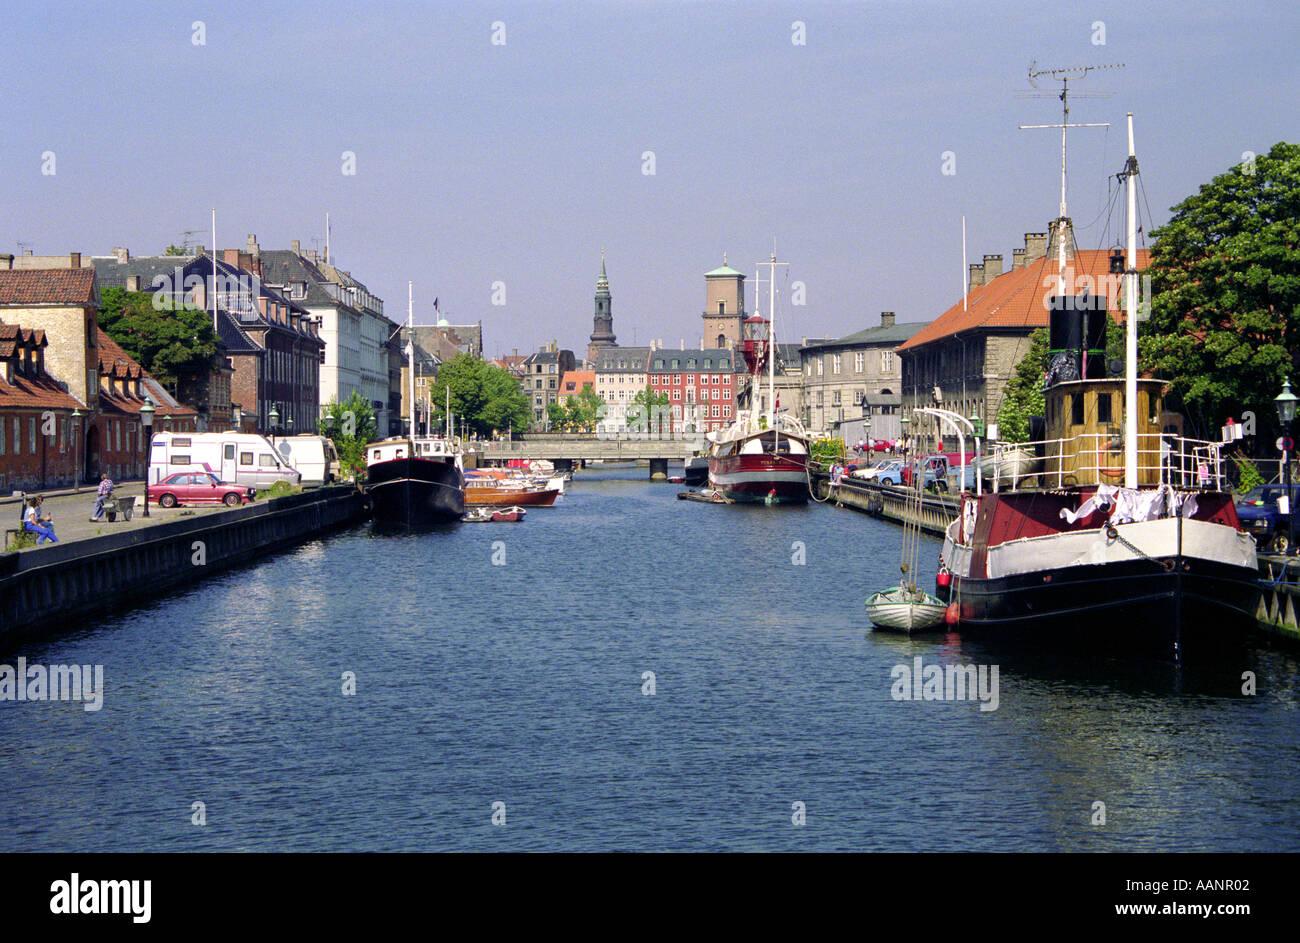 Canal viewed from Christians Brygge Copenhagen Denmark - Stock Image